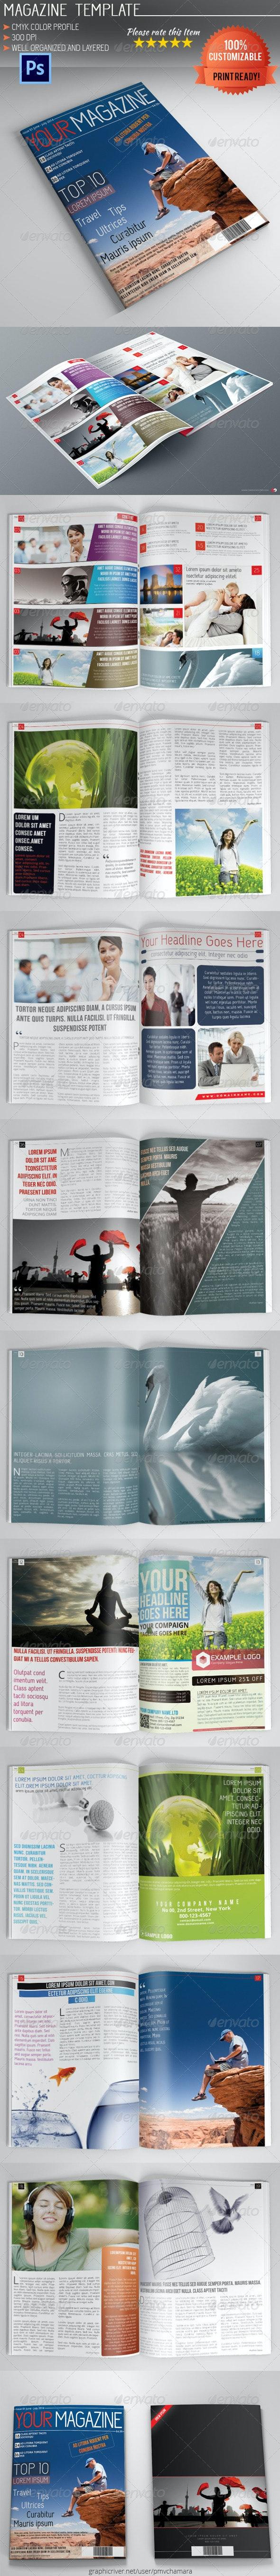 Photoshop Magazine Template Vol.4 - Magazines Print Templates